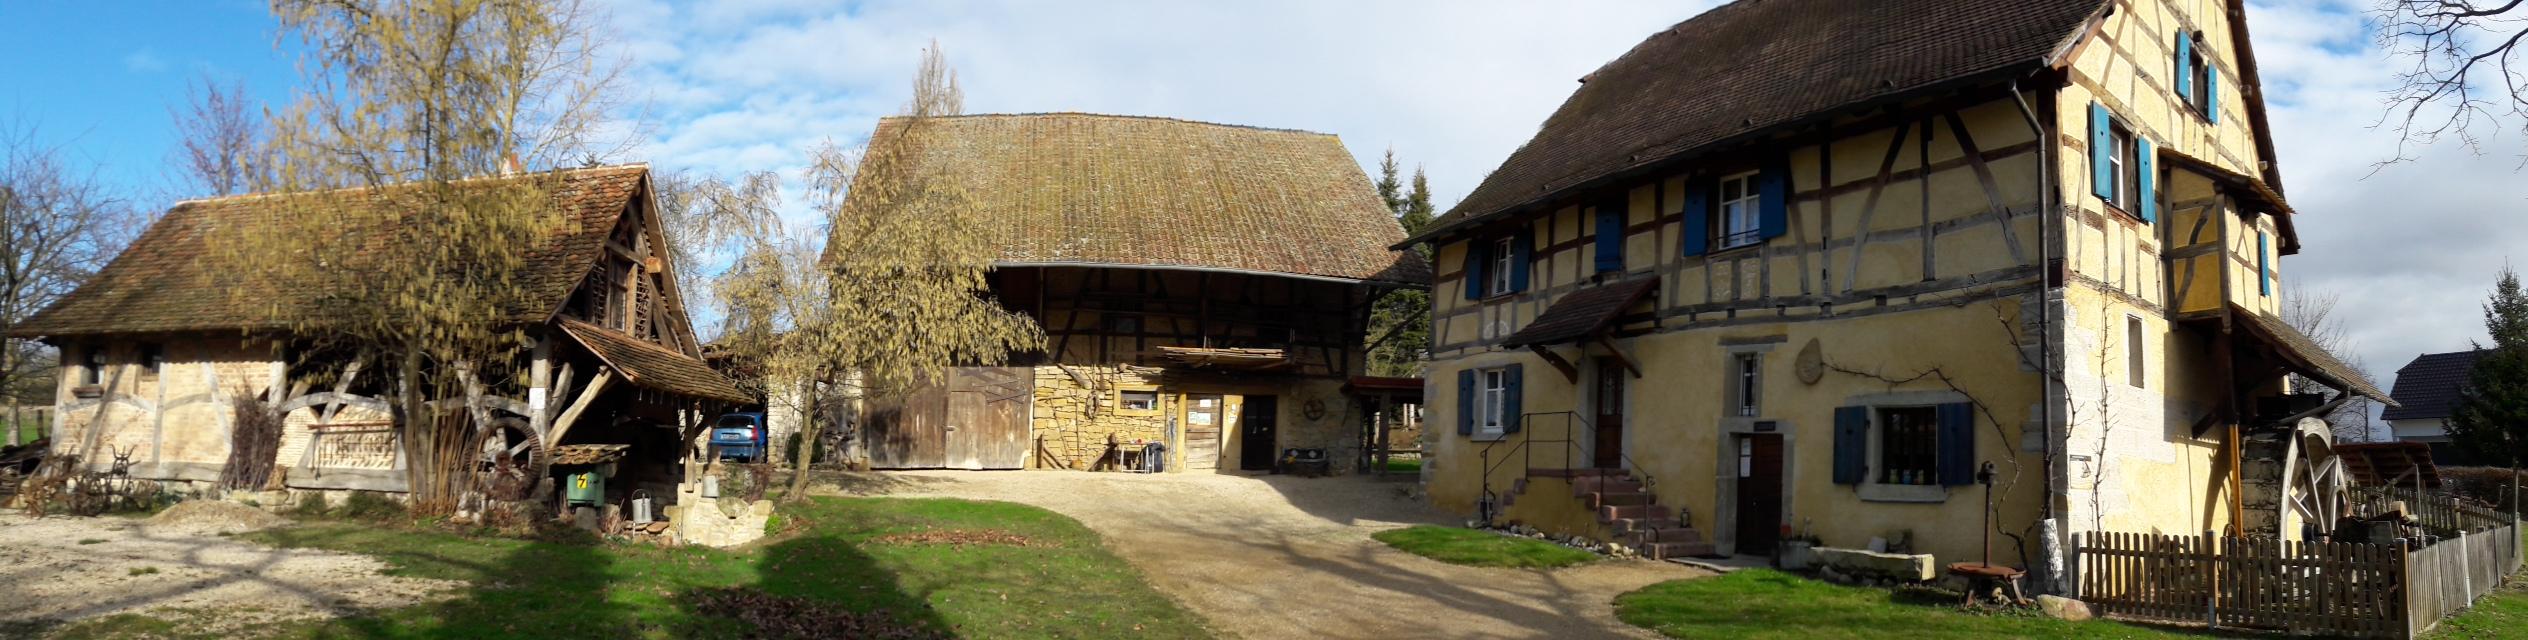 Moulin de Hundcbach - Photo http://www.moulin-hundsbach.com/